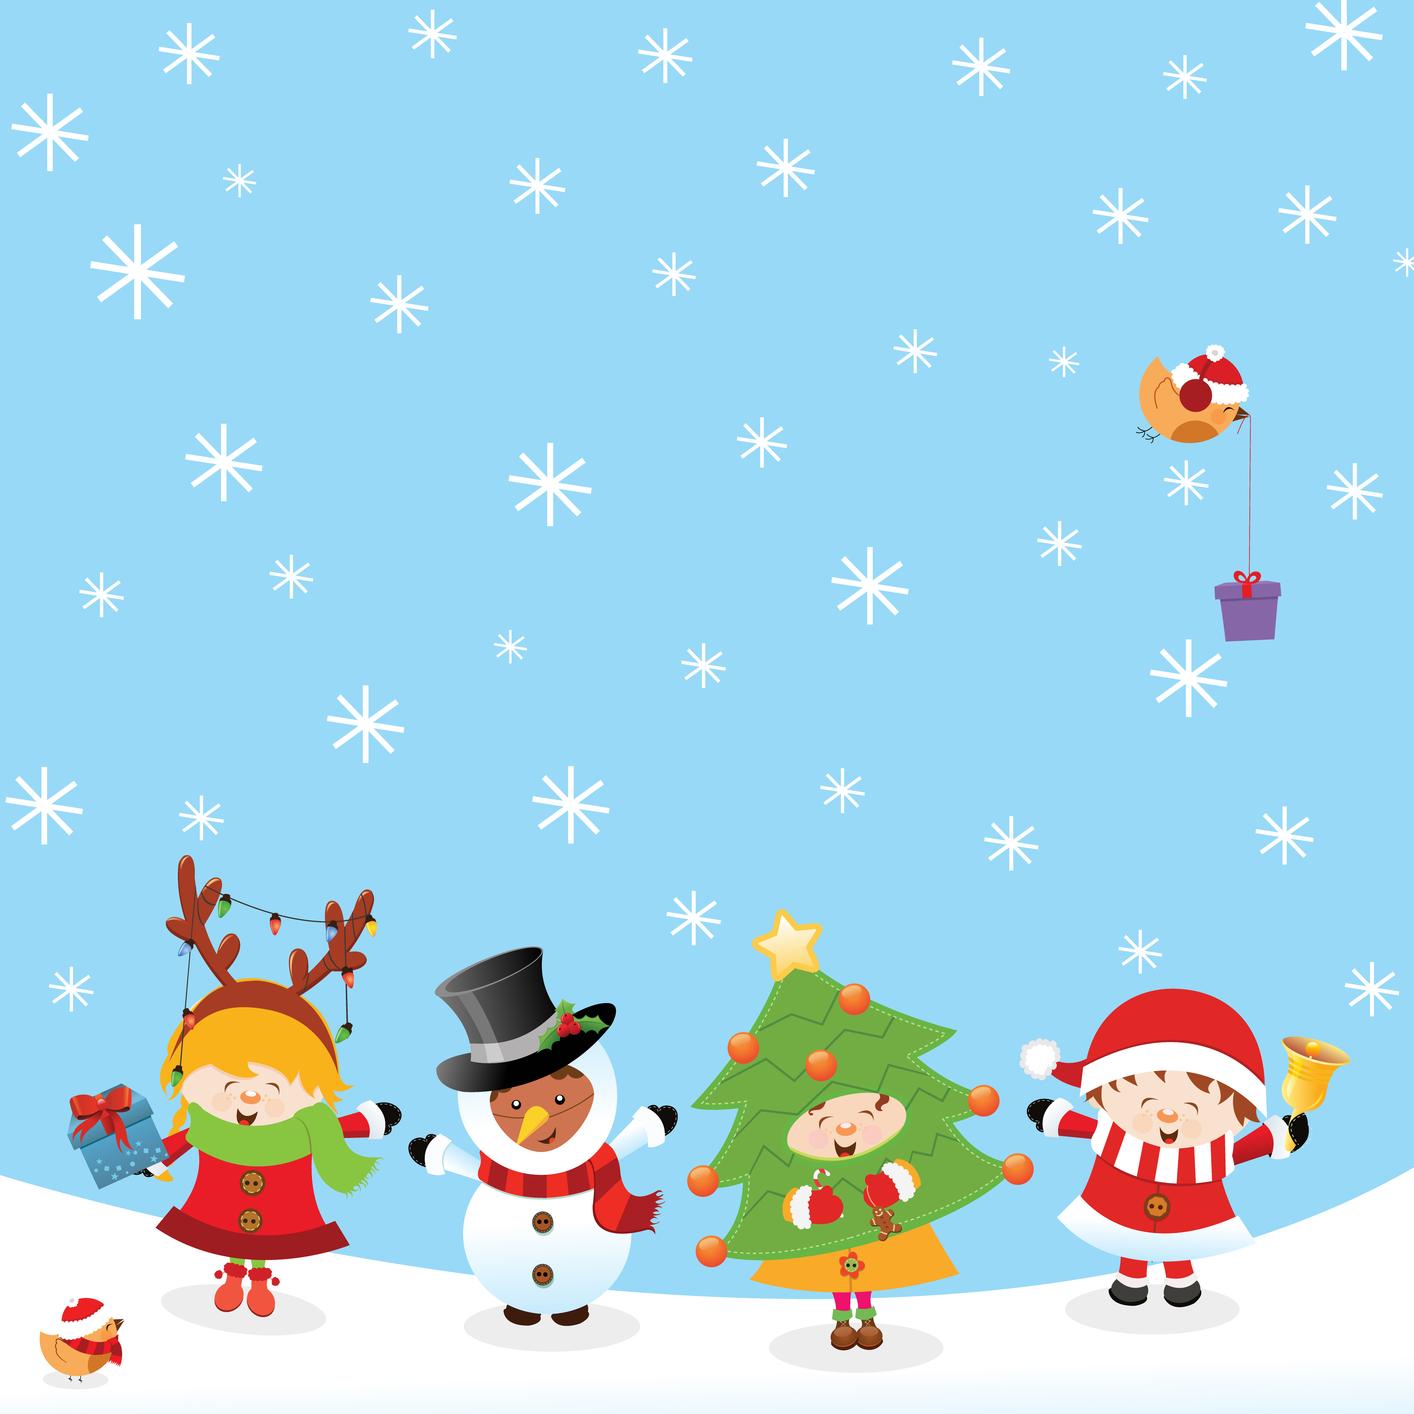 Iphone 5 Falling Snow Wallpaper Tarjetas De Navidad Tarjetas Navide 241 As Para Felicitar Las